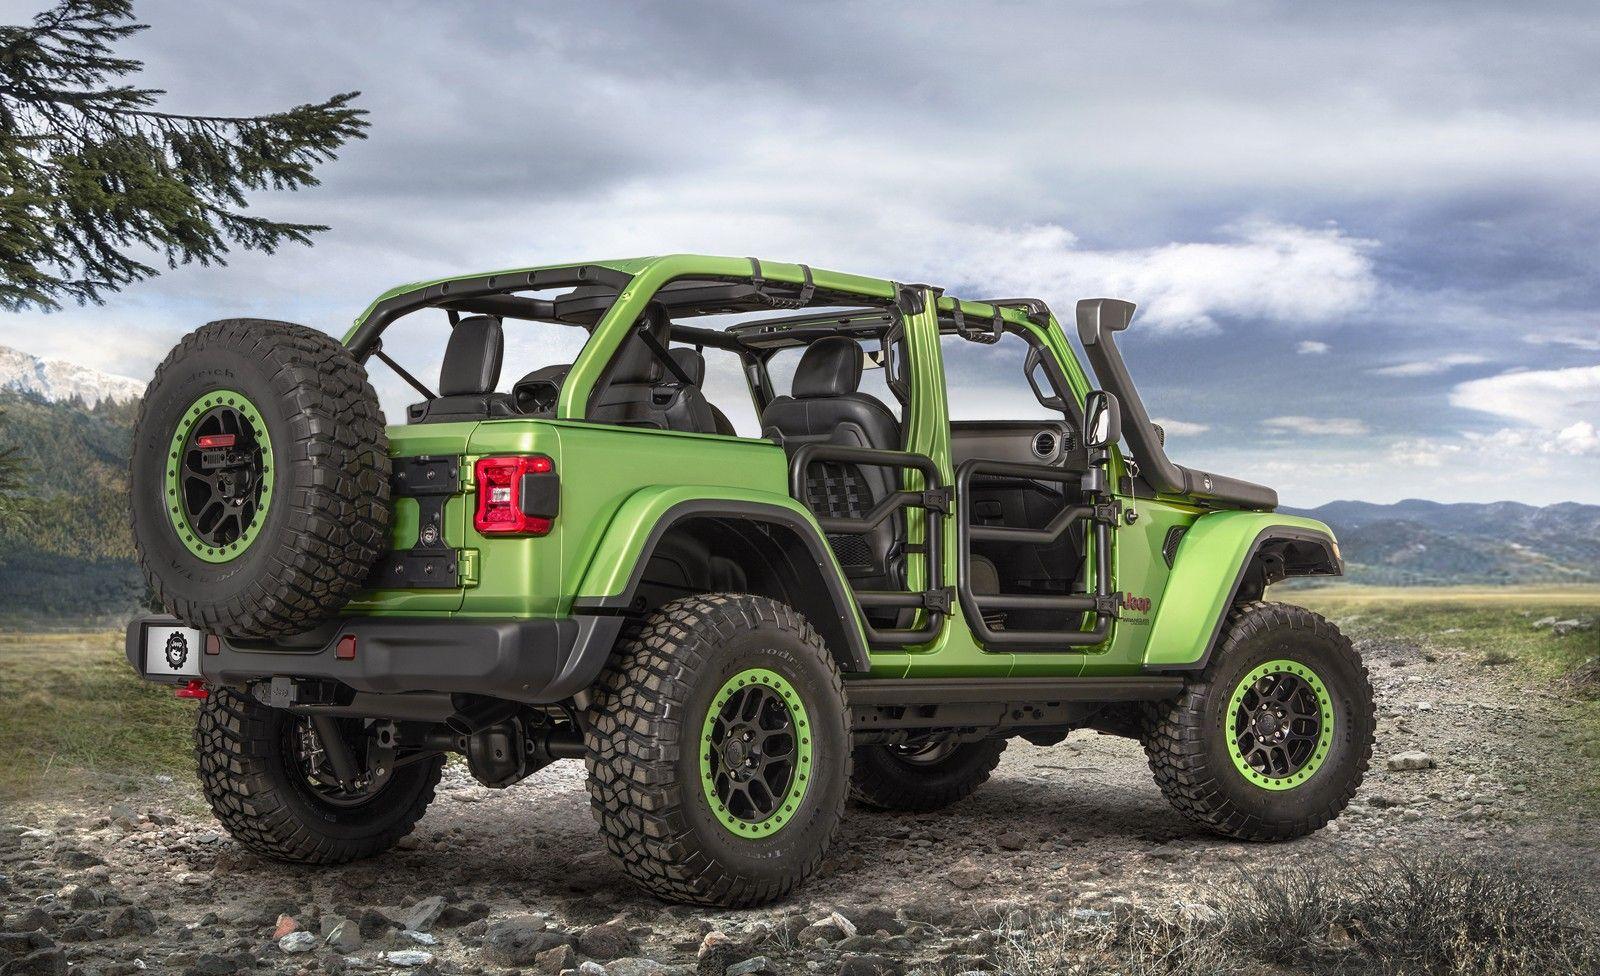 Mopar Jeep Jeep Wrangler Rubicon 2018 Jeep Wrangler Unlimited